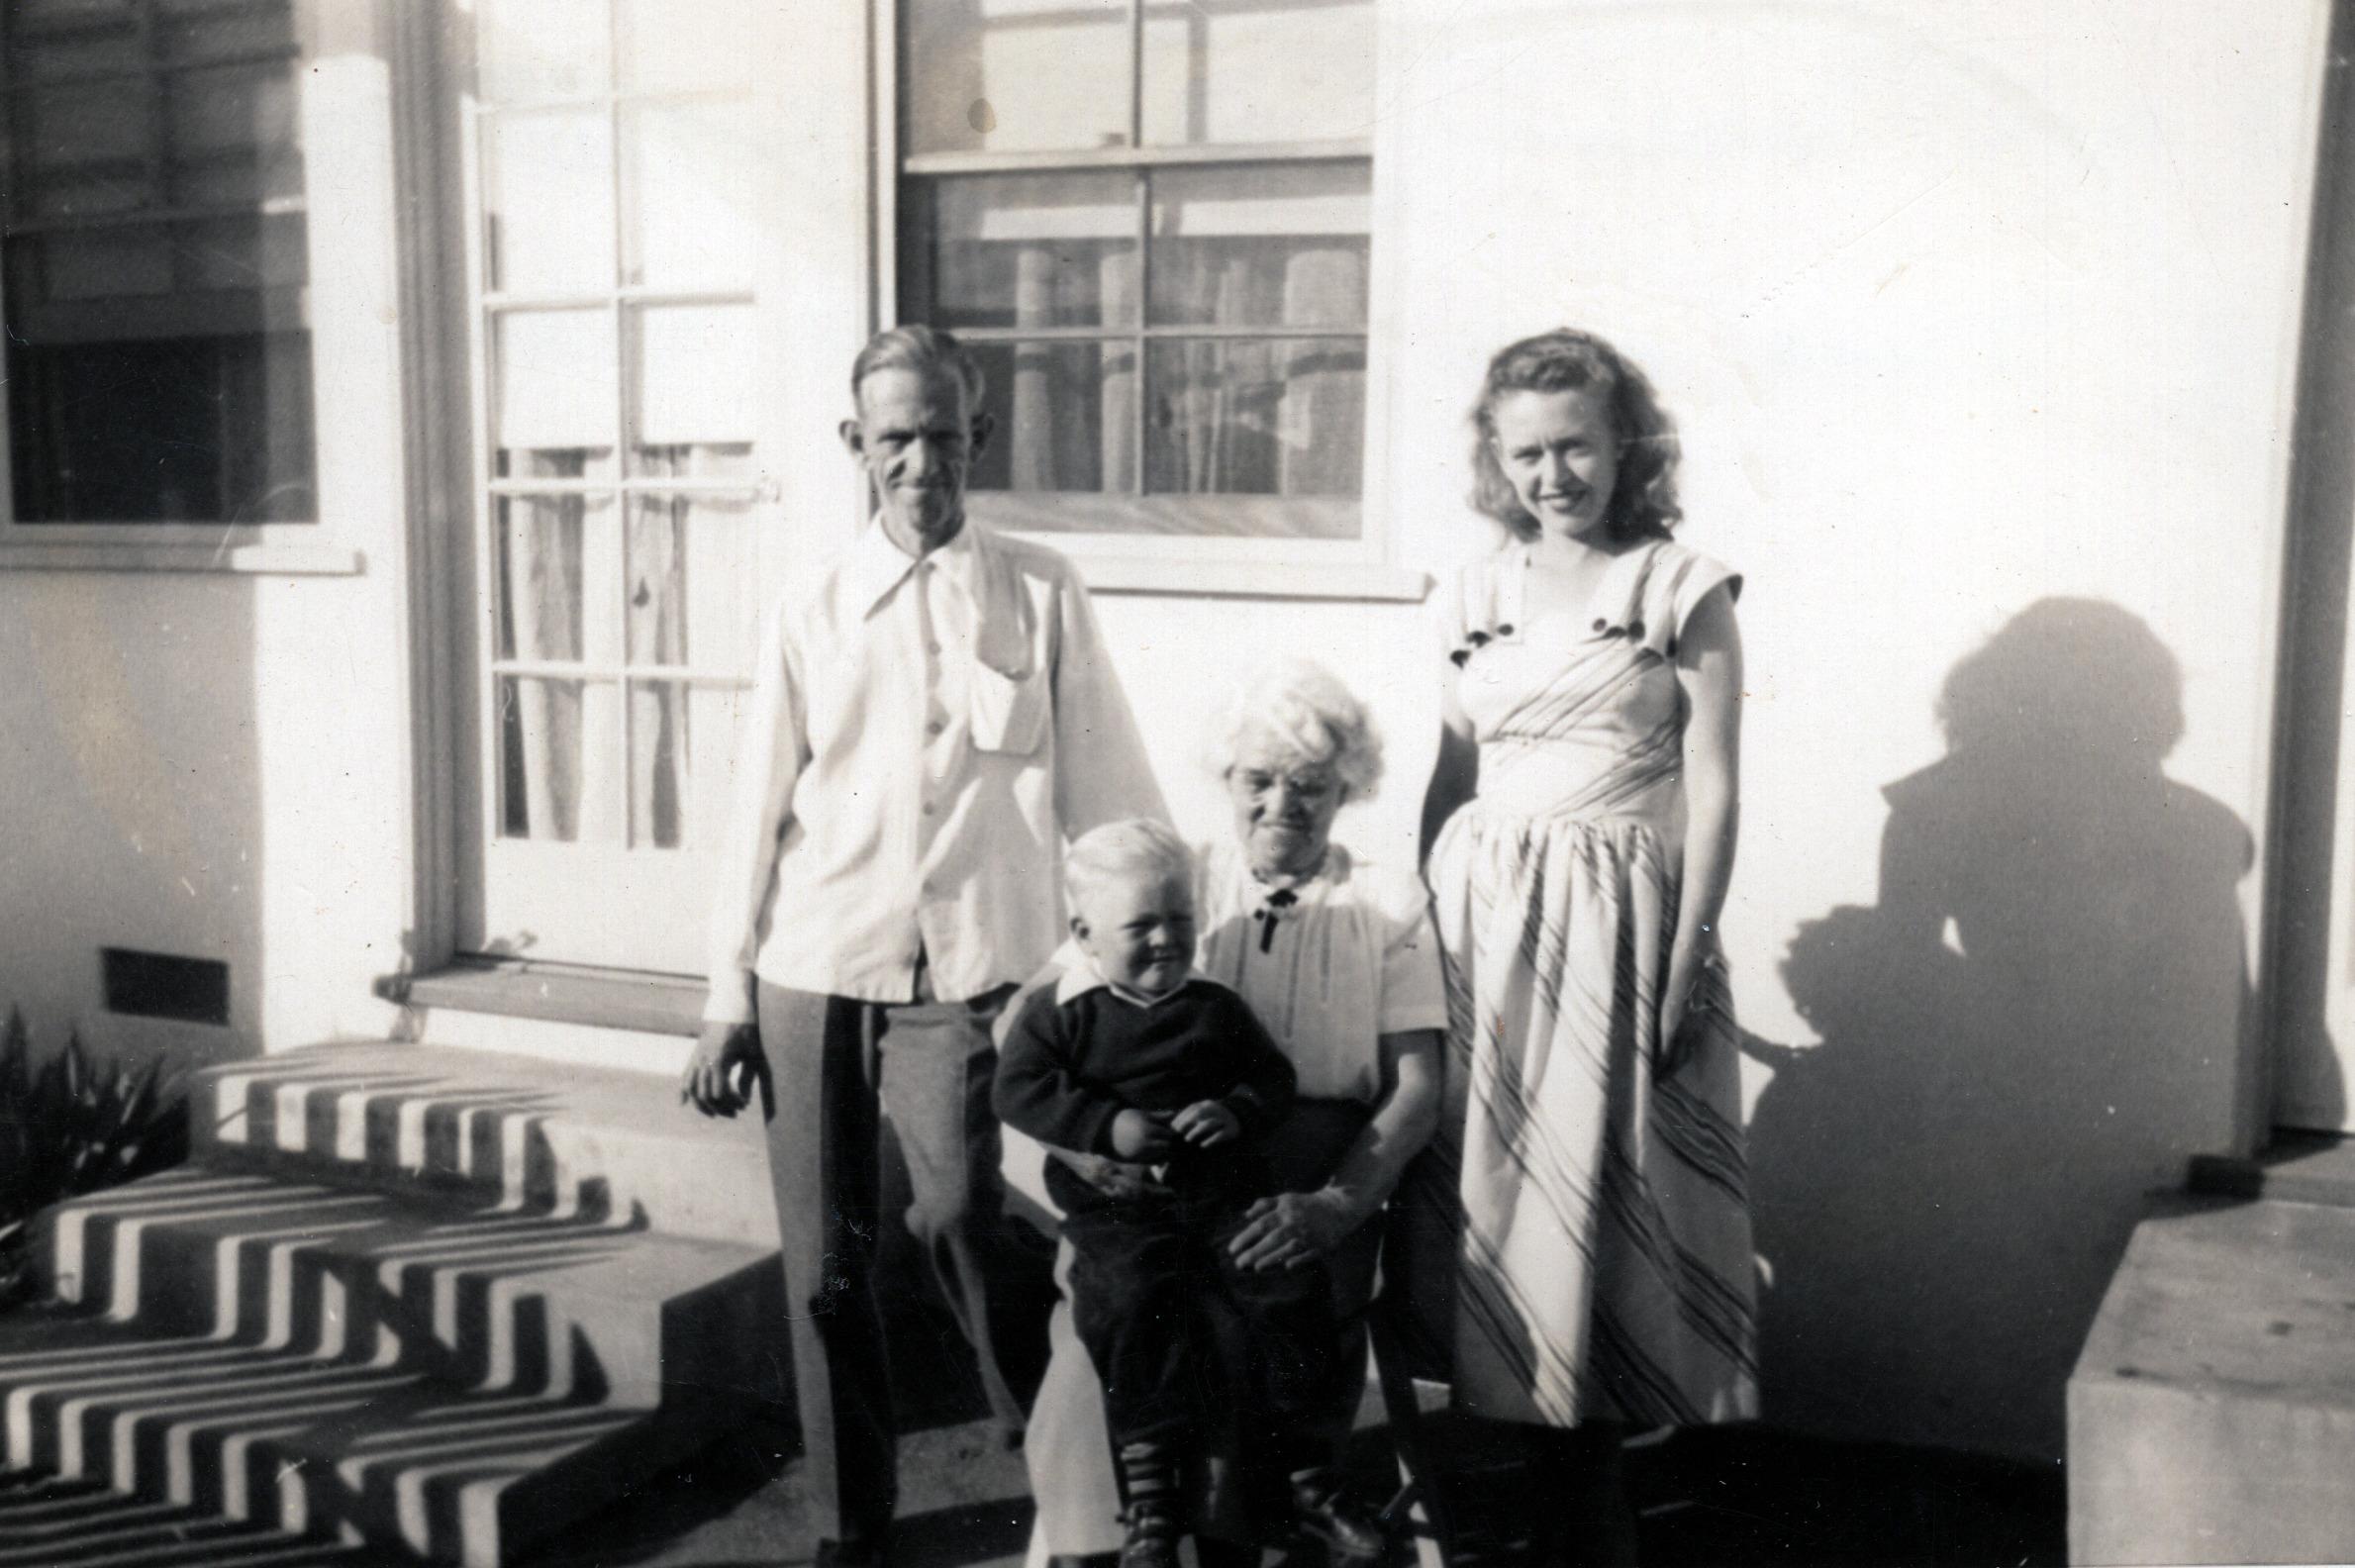 Four Generations - Harold, Duane, Jane & Shirley